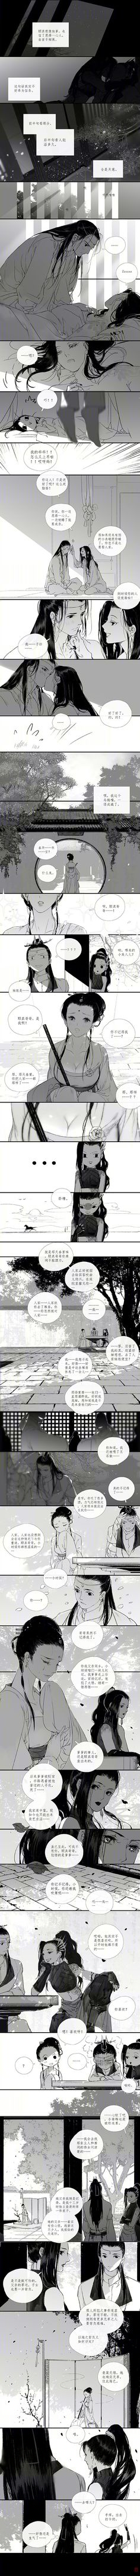 Dịch giúp tôi điiiiiiii Manga Art, Manga Anime, Read Anime, Manga Story, Chinese Cartoon, Cute Couple Art, Inazuma Eleven Go, Short Comics, Cool Animations